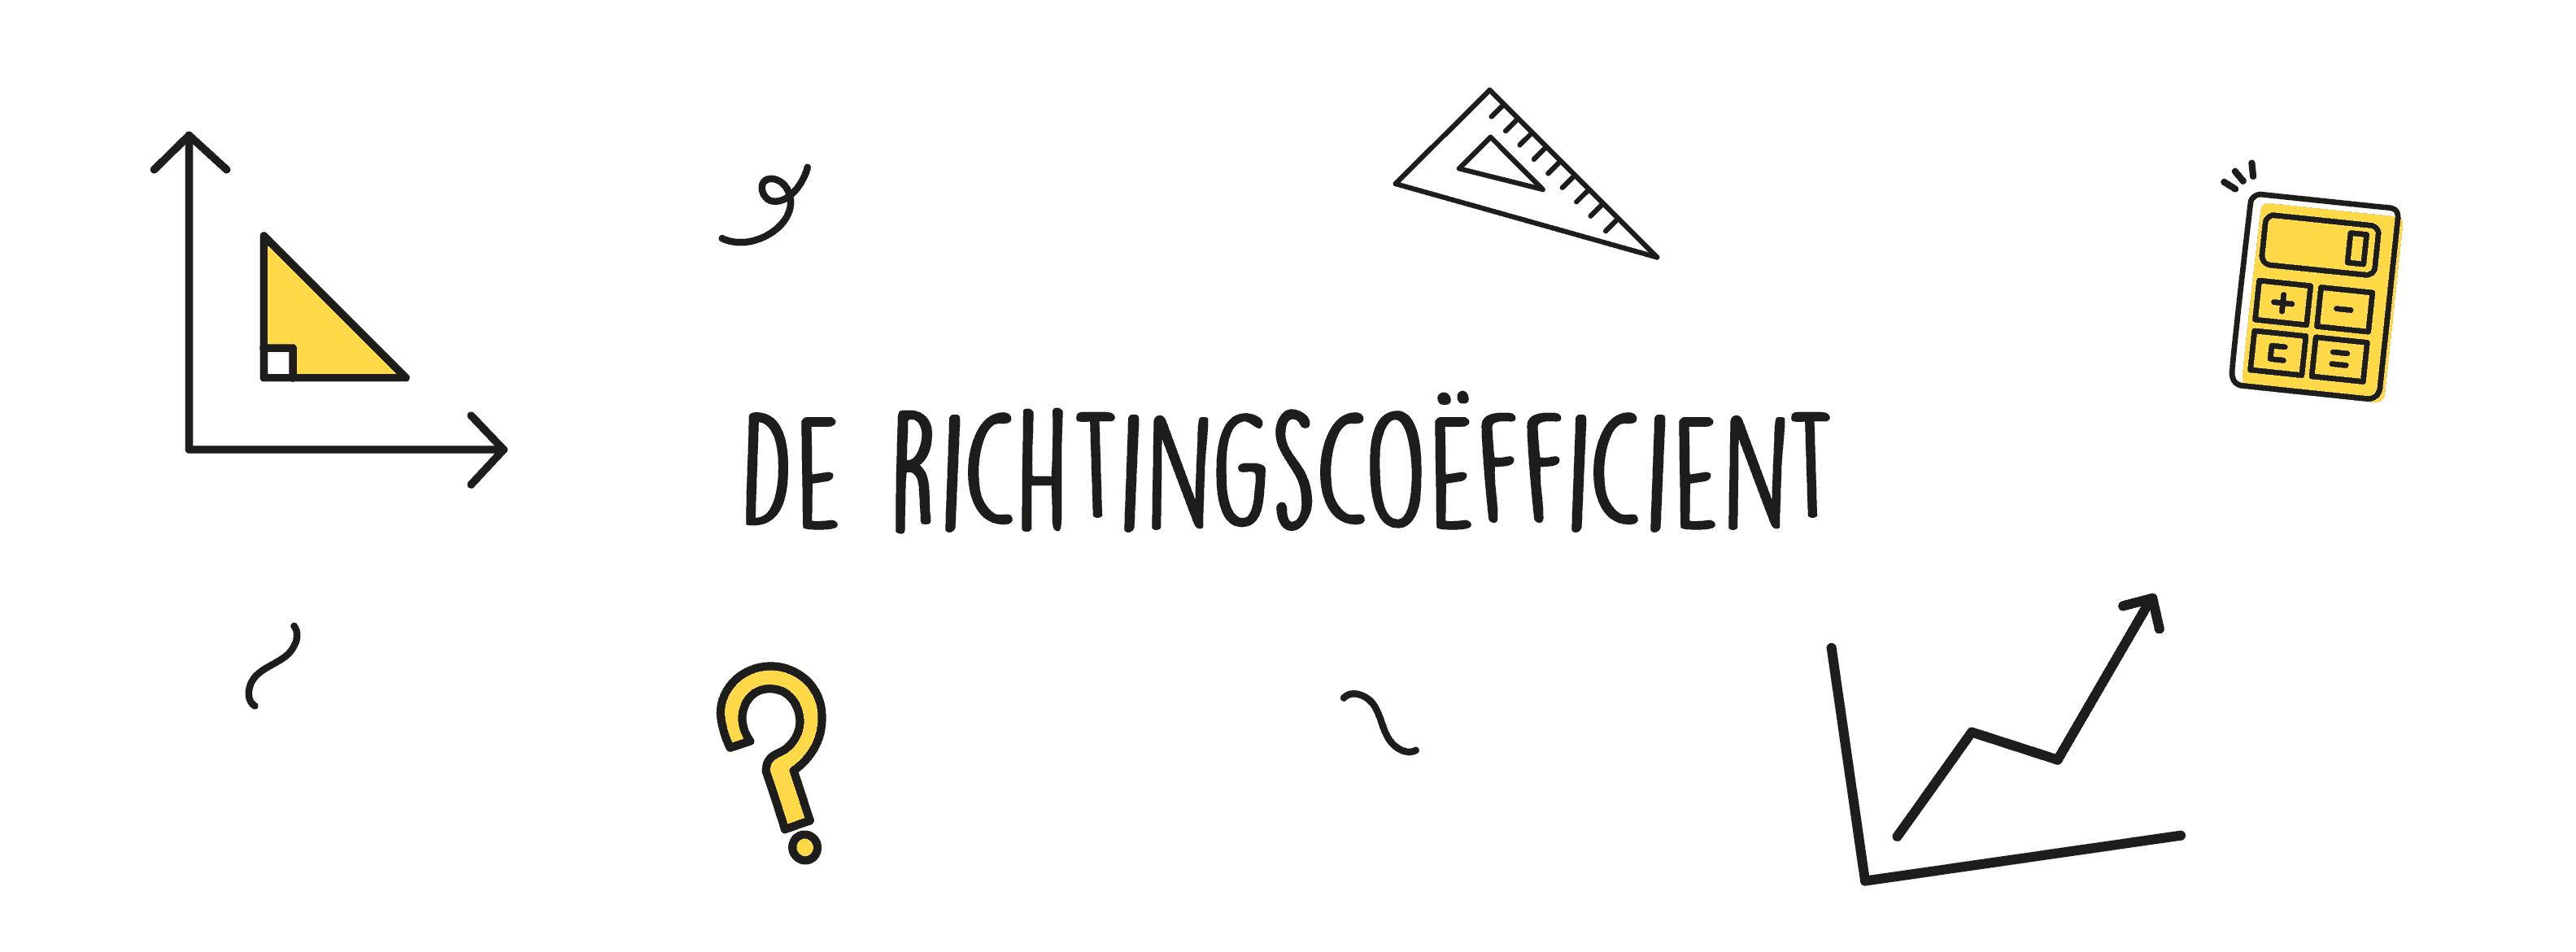 De Richtingscoëfficient